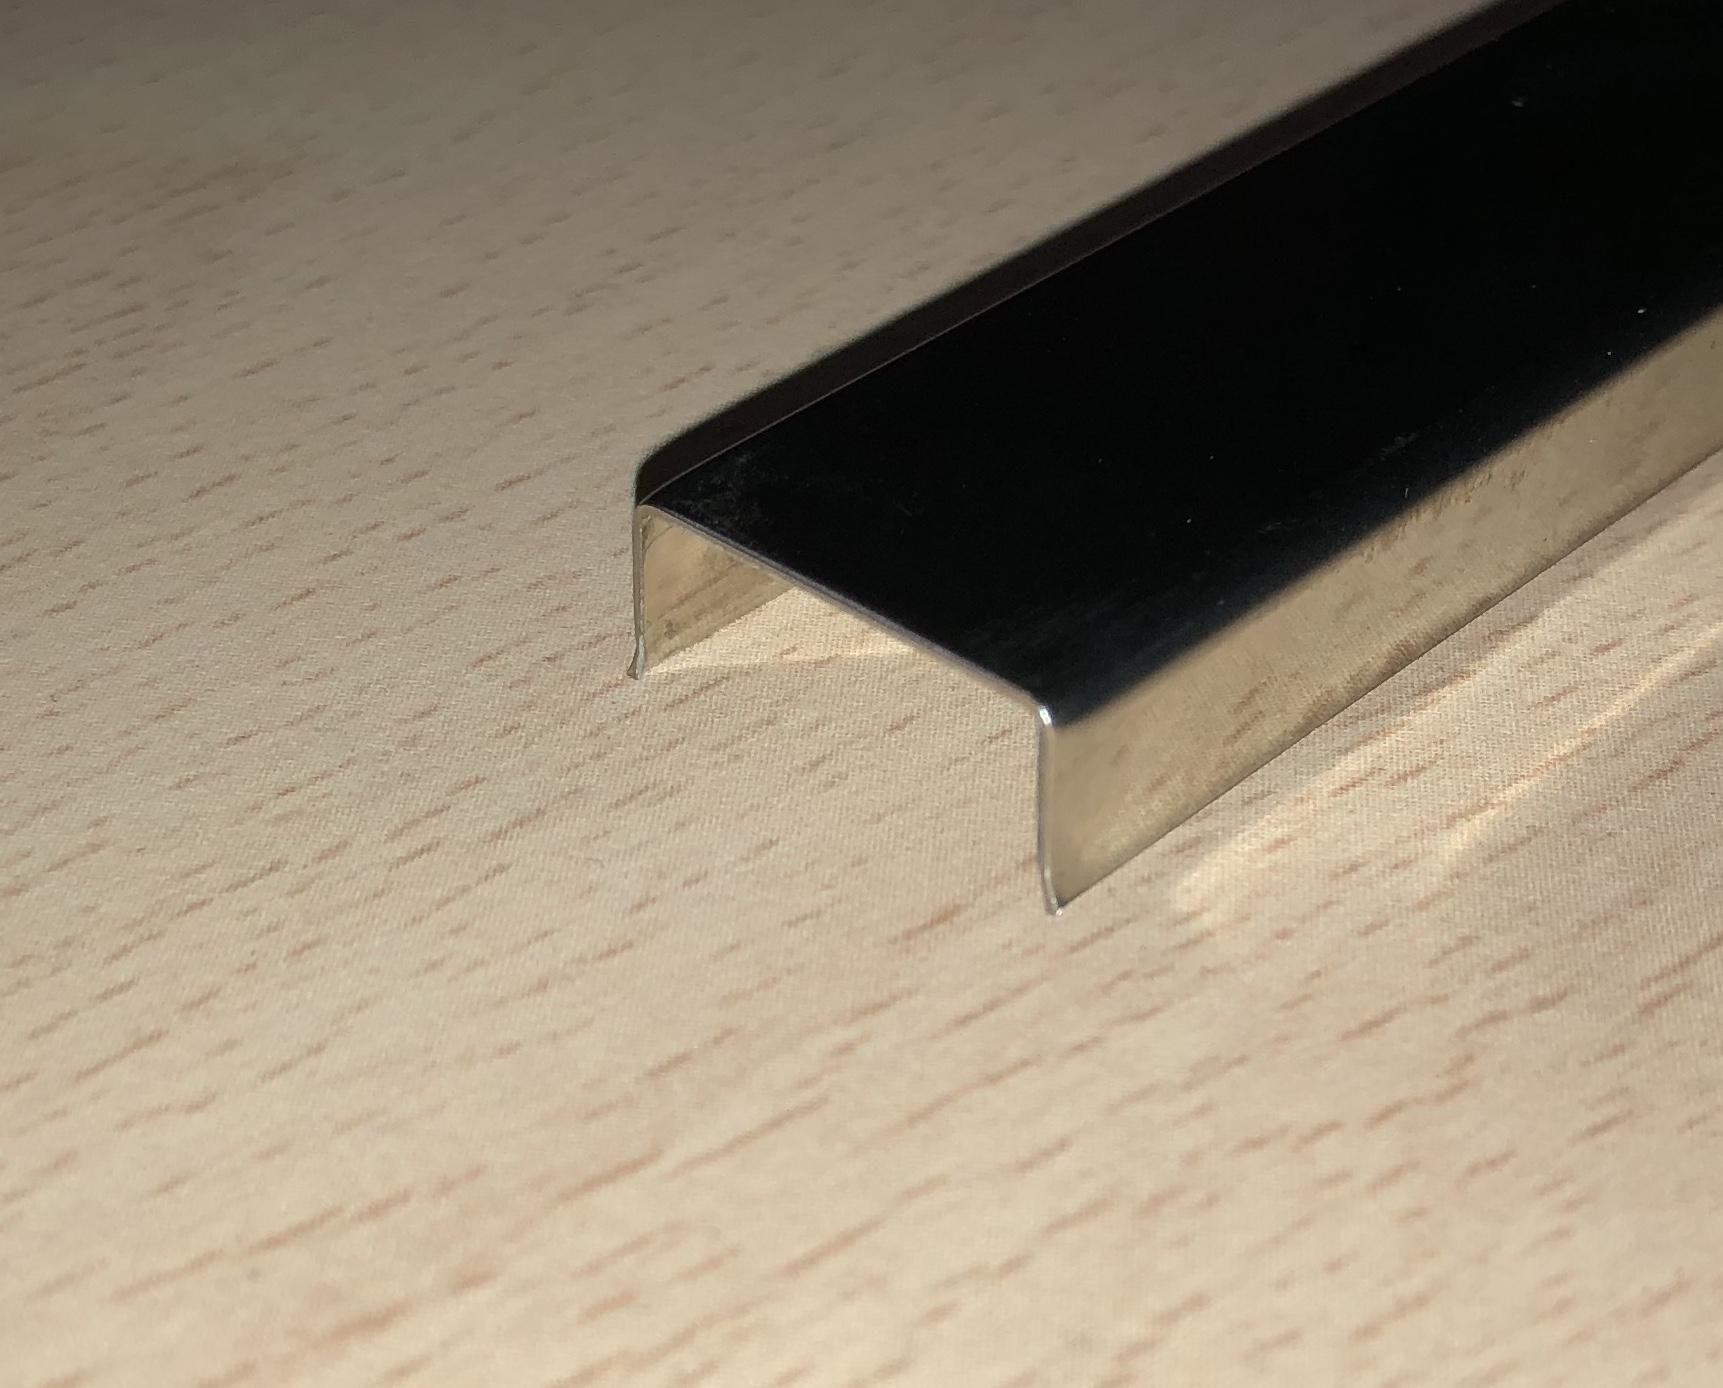 Casmon perfil cenefa acero inoxidable en u 18 x 8 mm - Perfil acero inoxidable precio ...